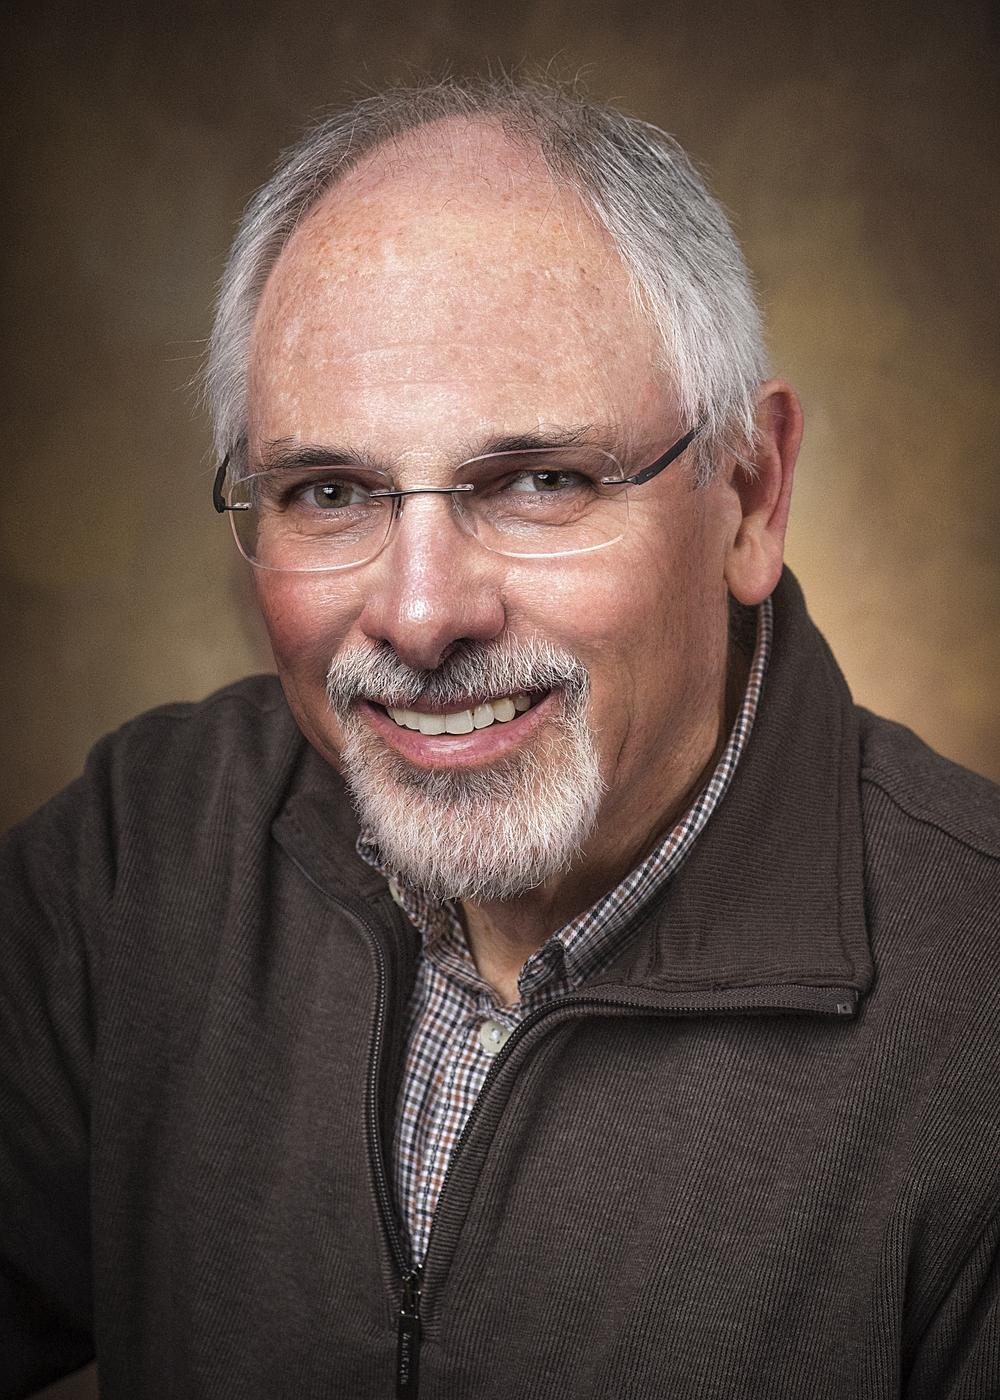 Doug Murray, Homeless Programs Outreach Director